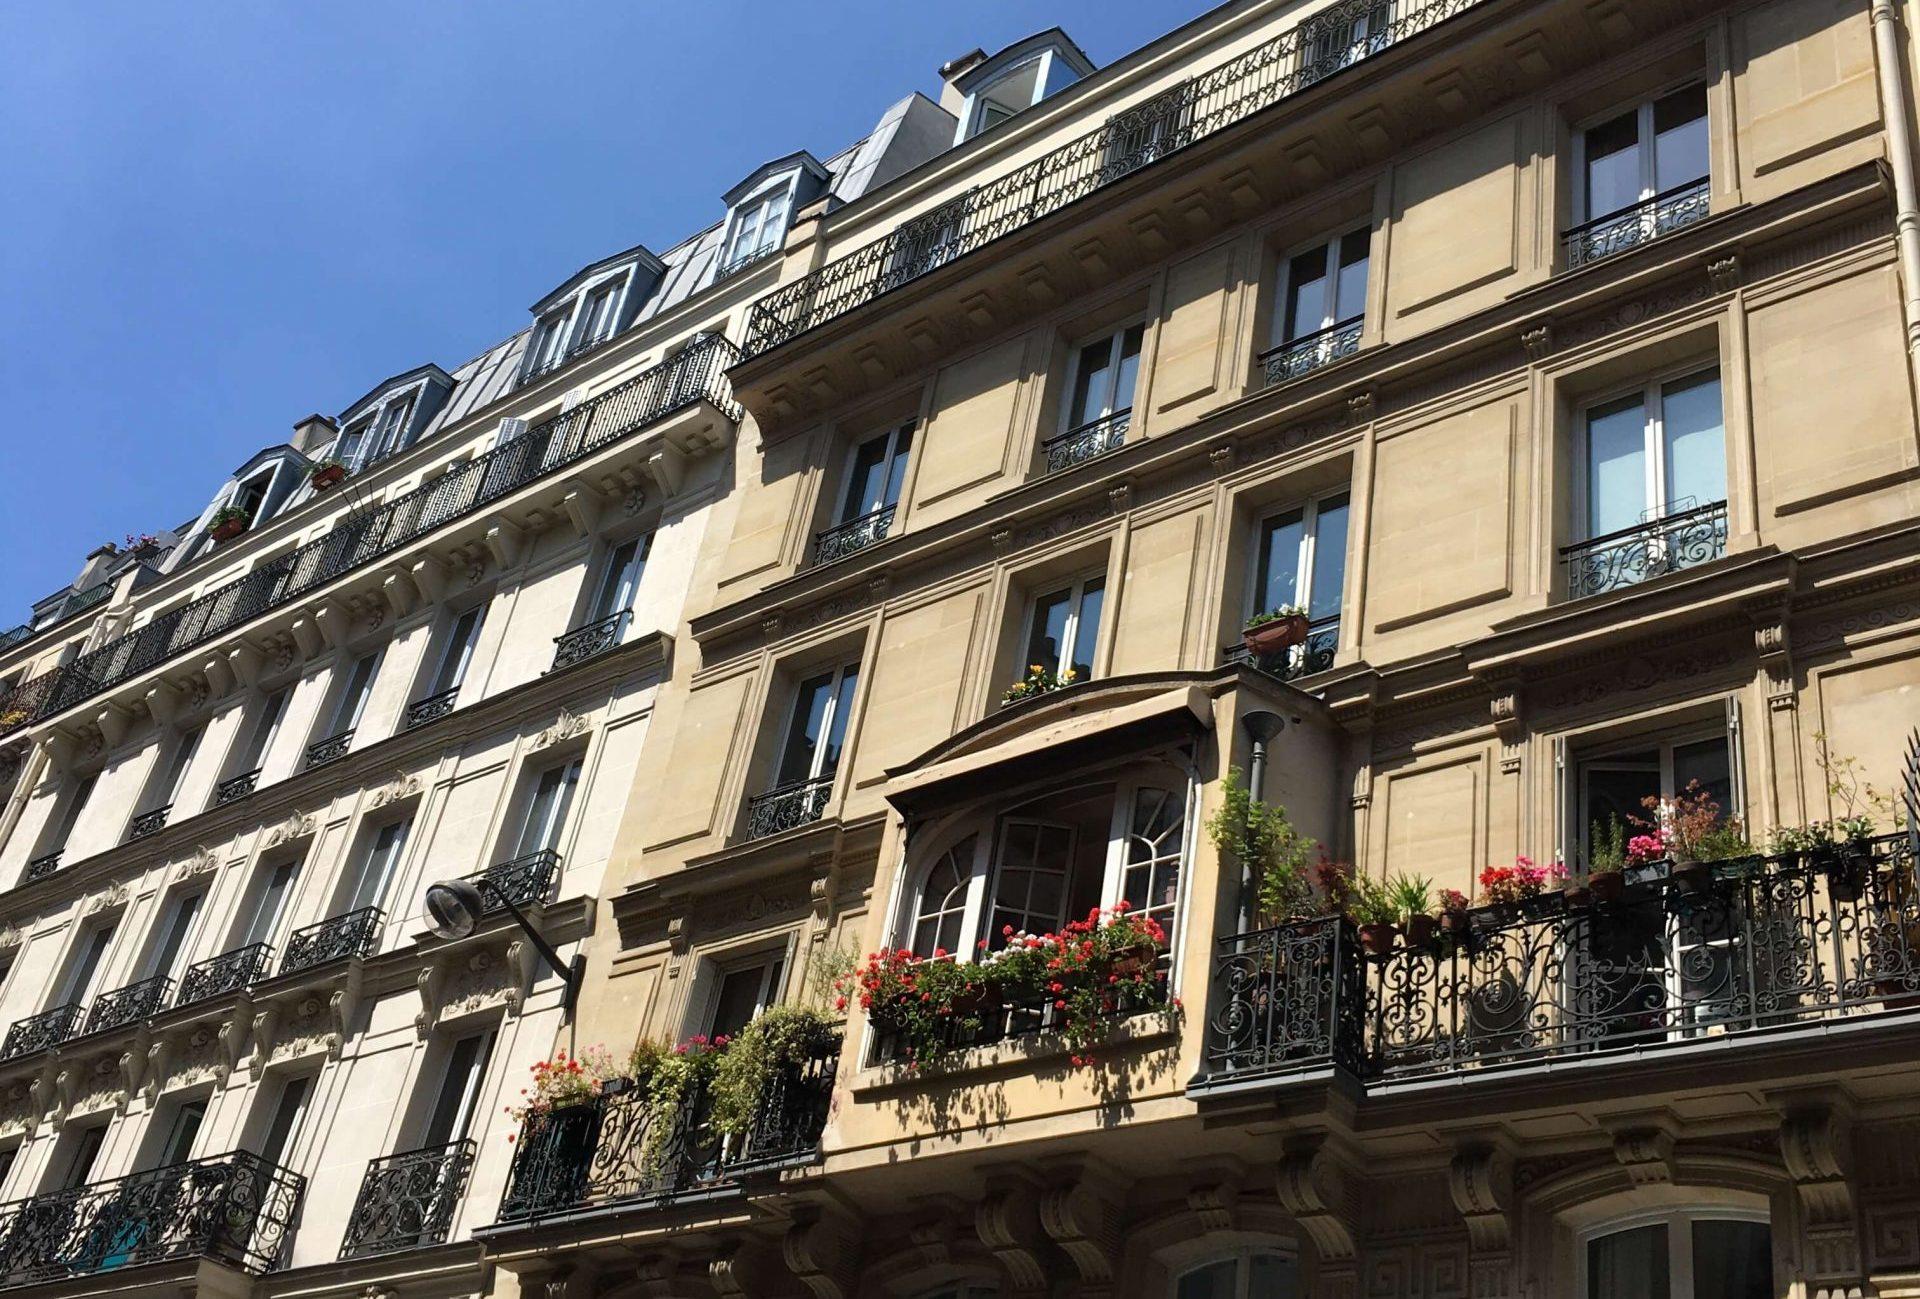 balconies in Paris with flowers